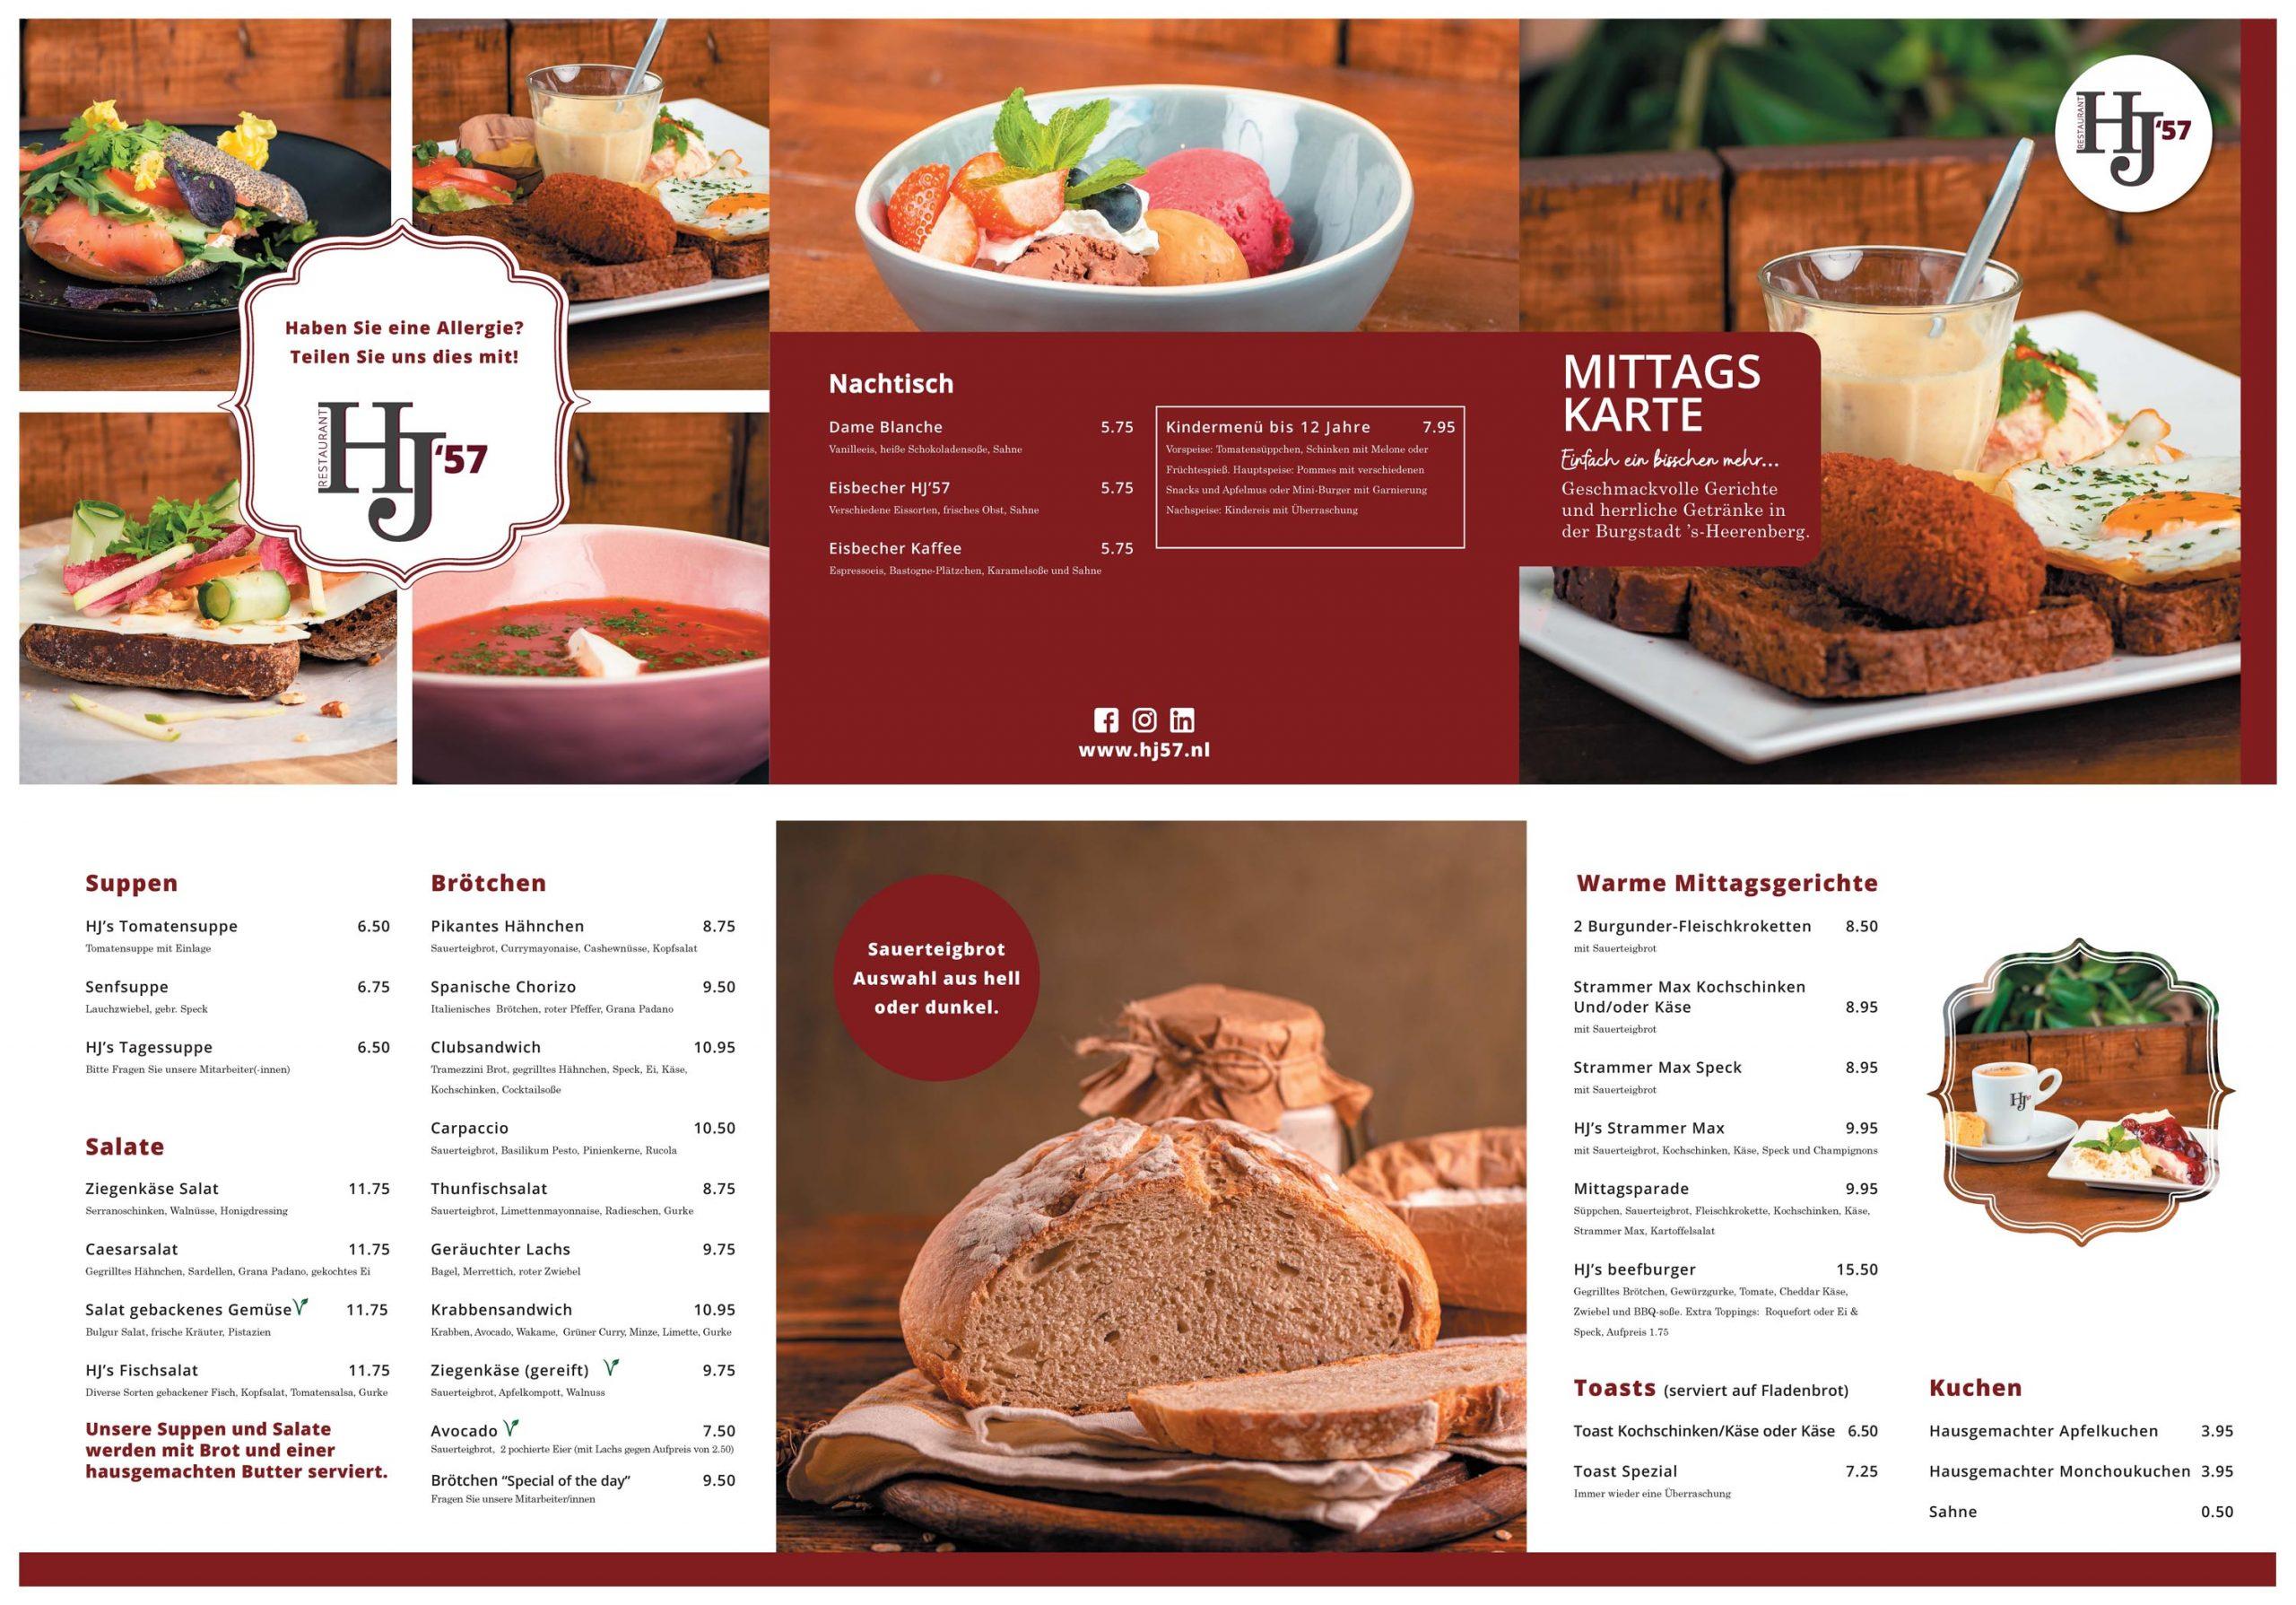 HJ57 Duitse lunchkaart